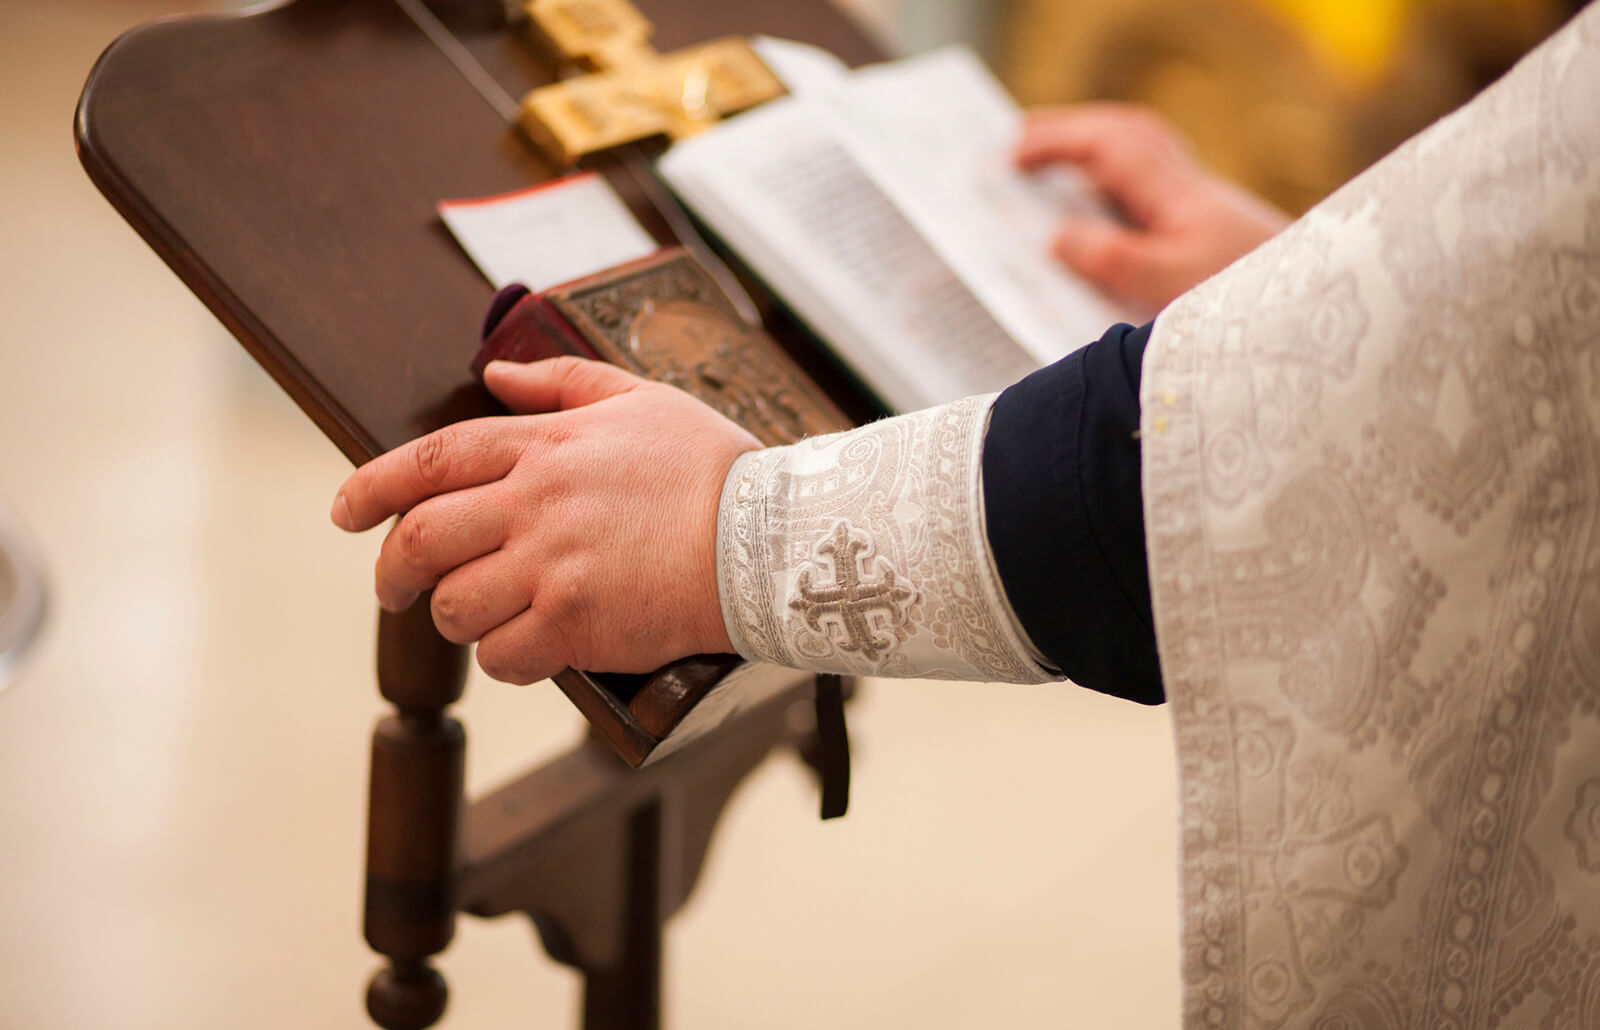 Catholic Funeral Readings | LoveToKnow